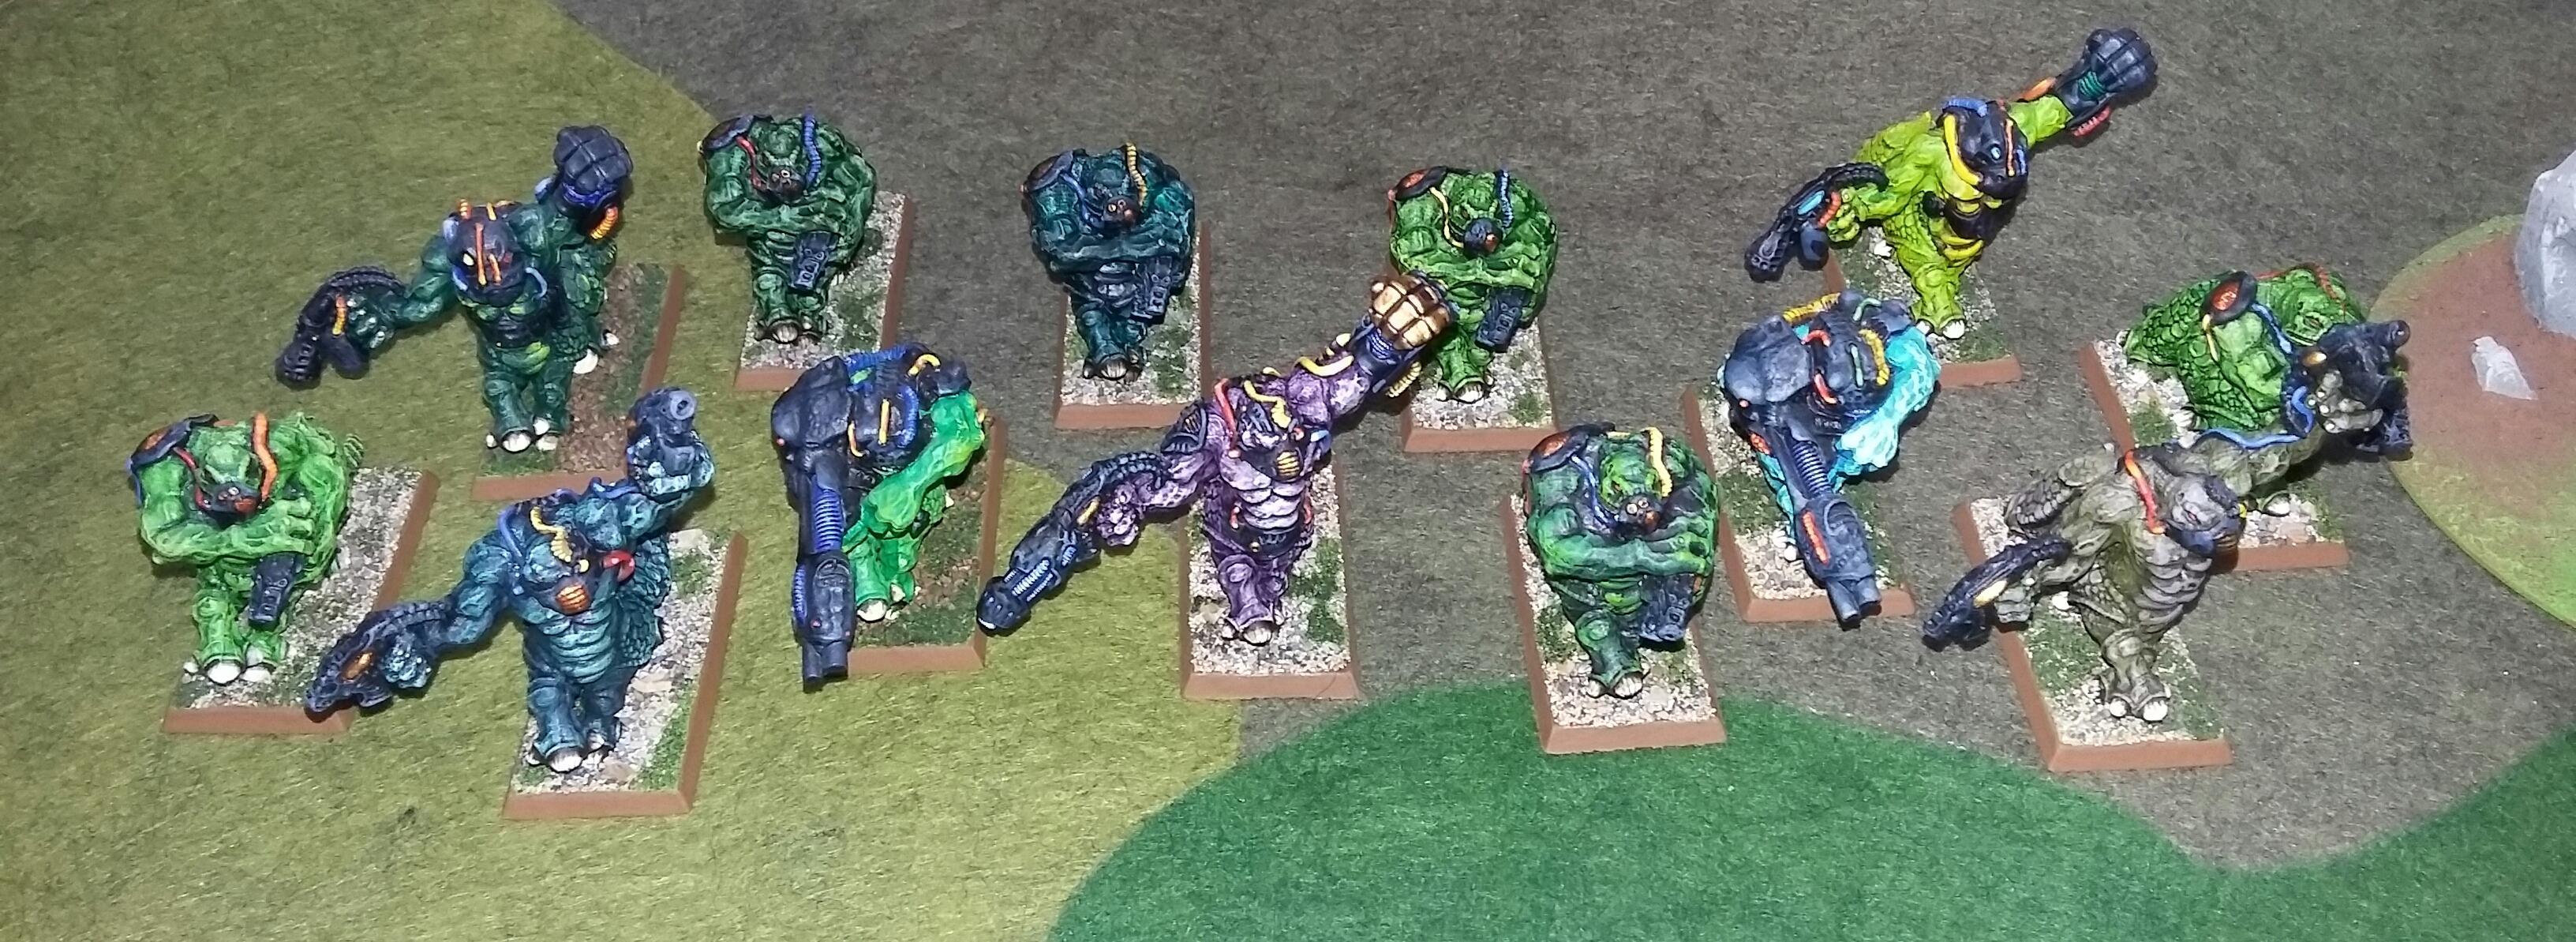 Conversion, Oldhammer, Warhammer 40,000, Zoat